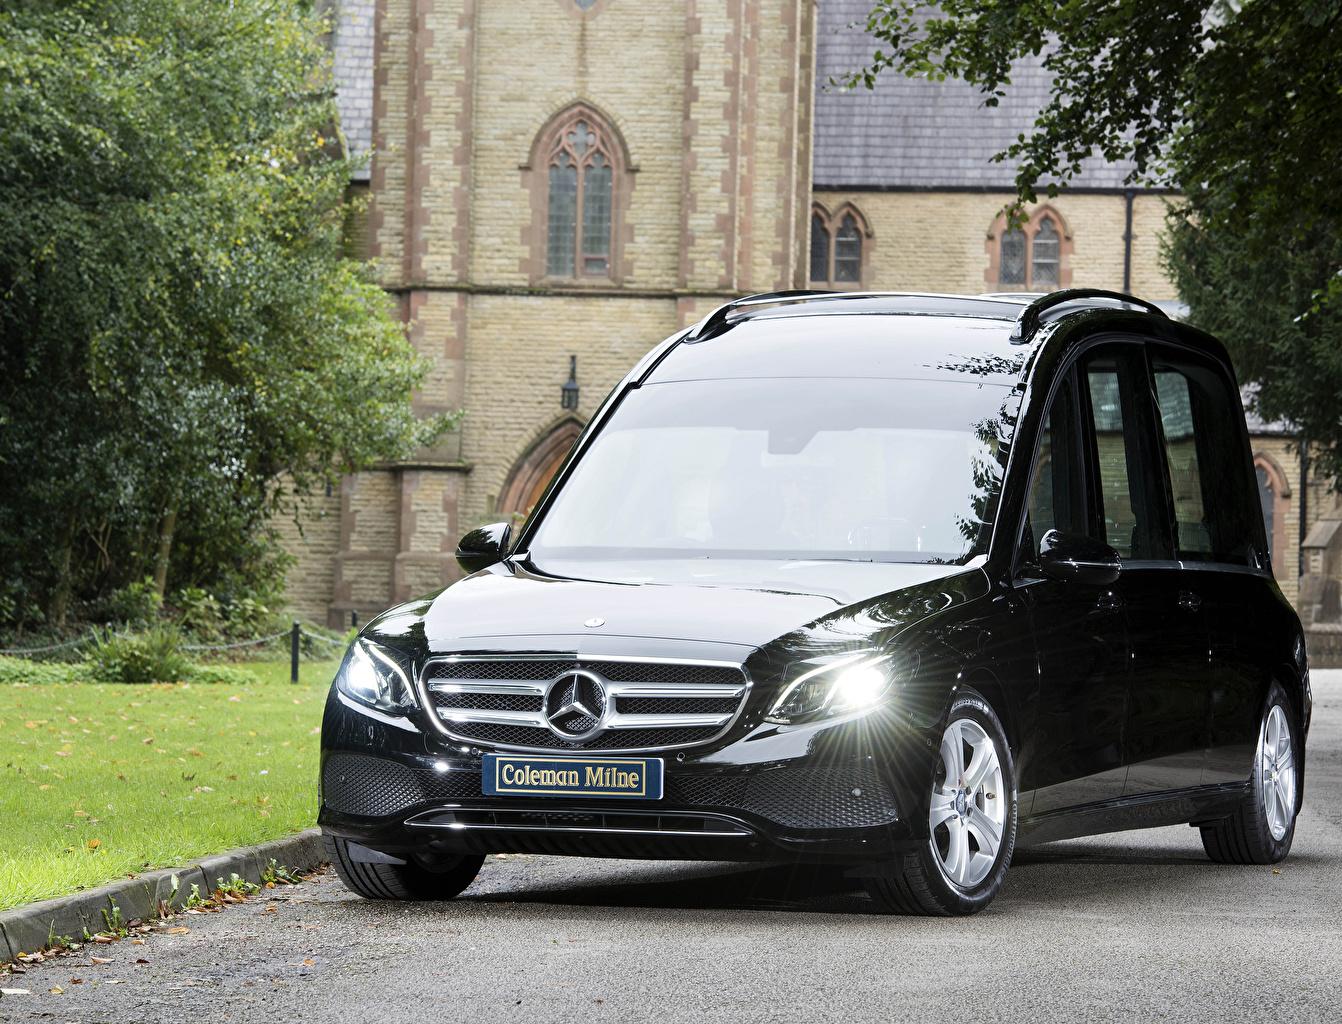 Mercedes-Benz_2017-19_Coleman_Milne_Mercedes-Benz_559275_1342x1024.jpg